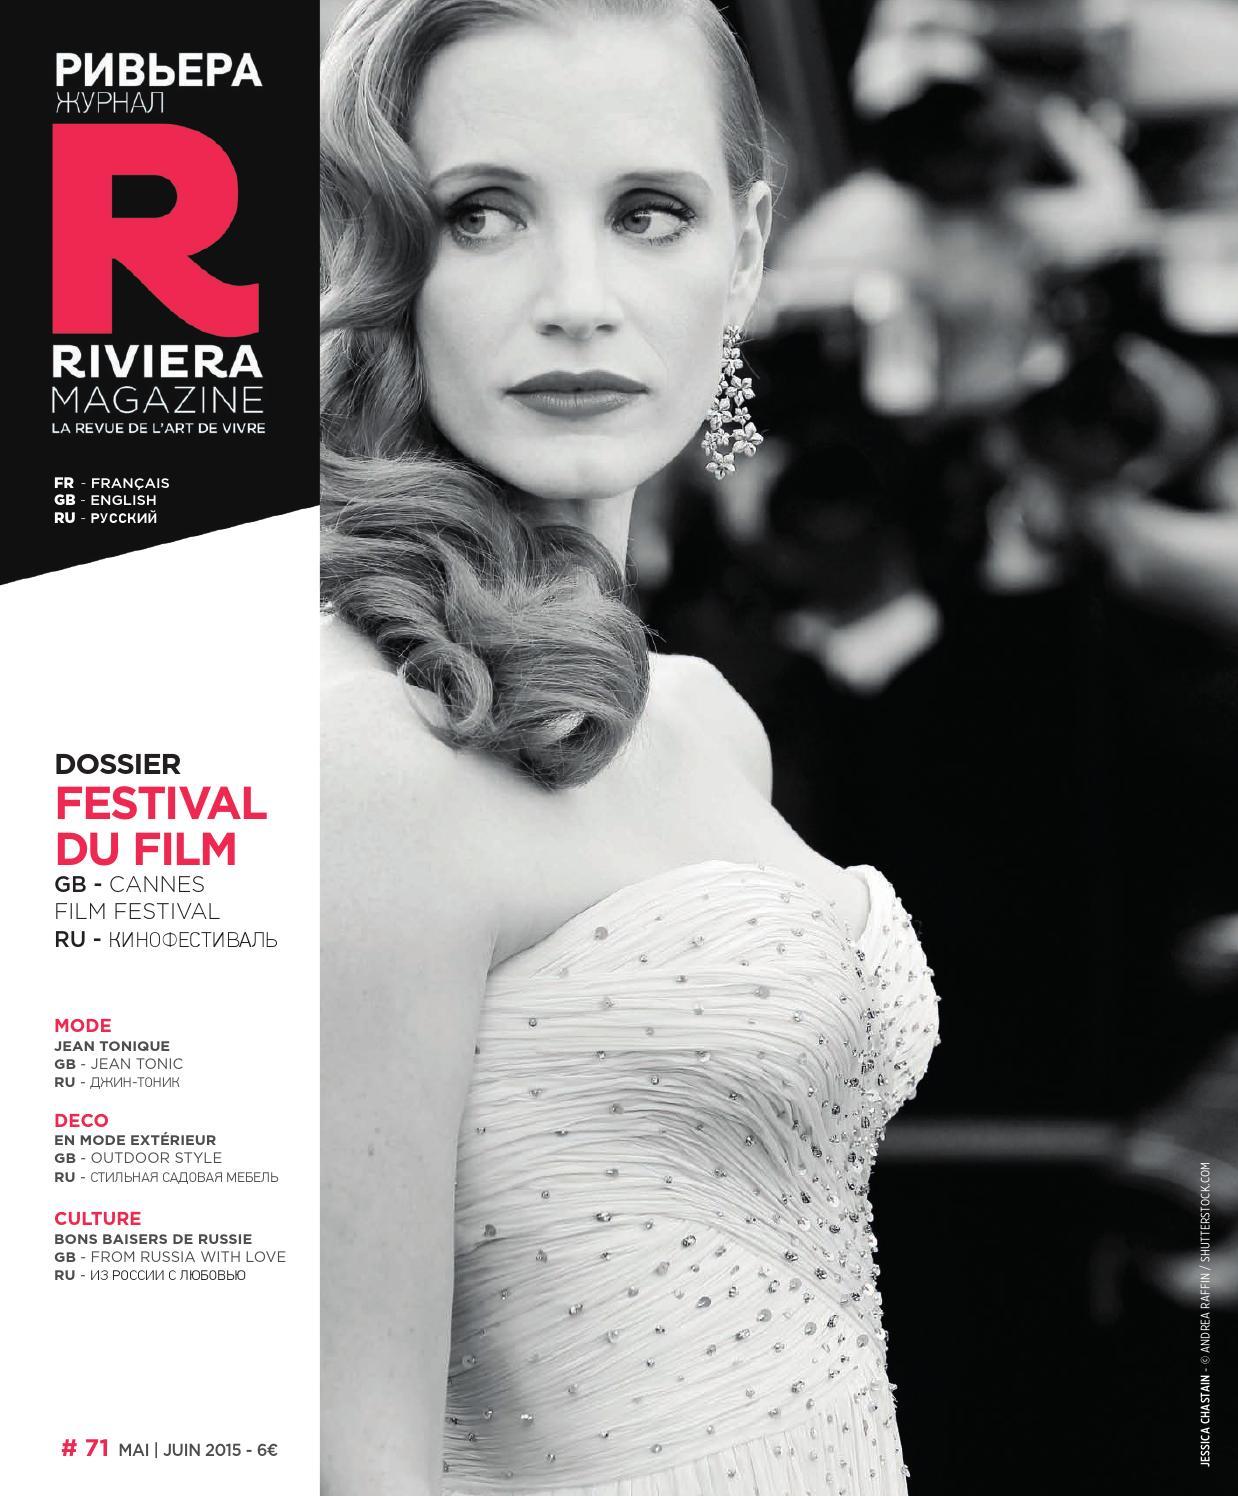 Riviera Magazine n°71 - mai-juin 2015 by Riviera Magazine - issuu 0fa68e99939e